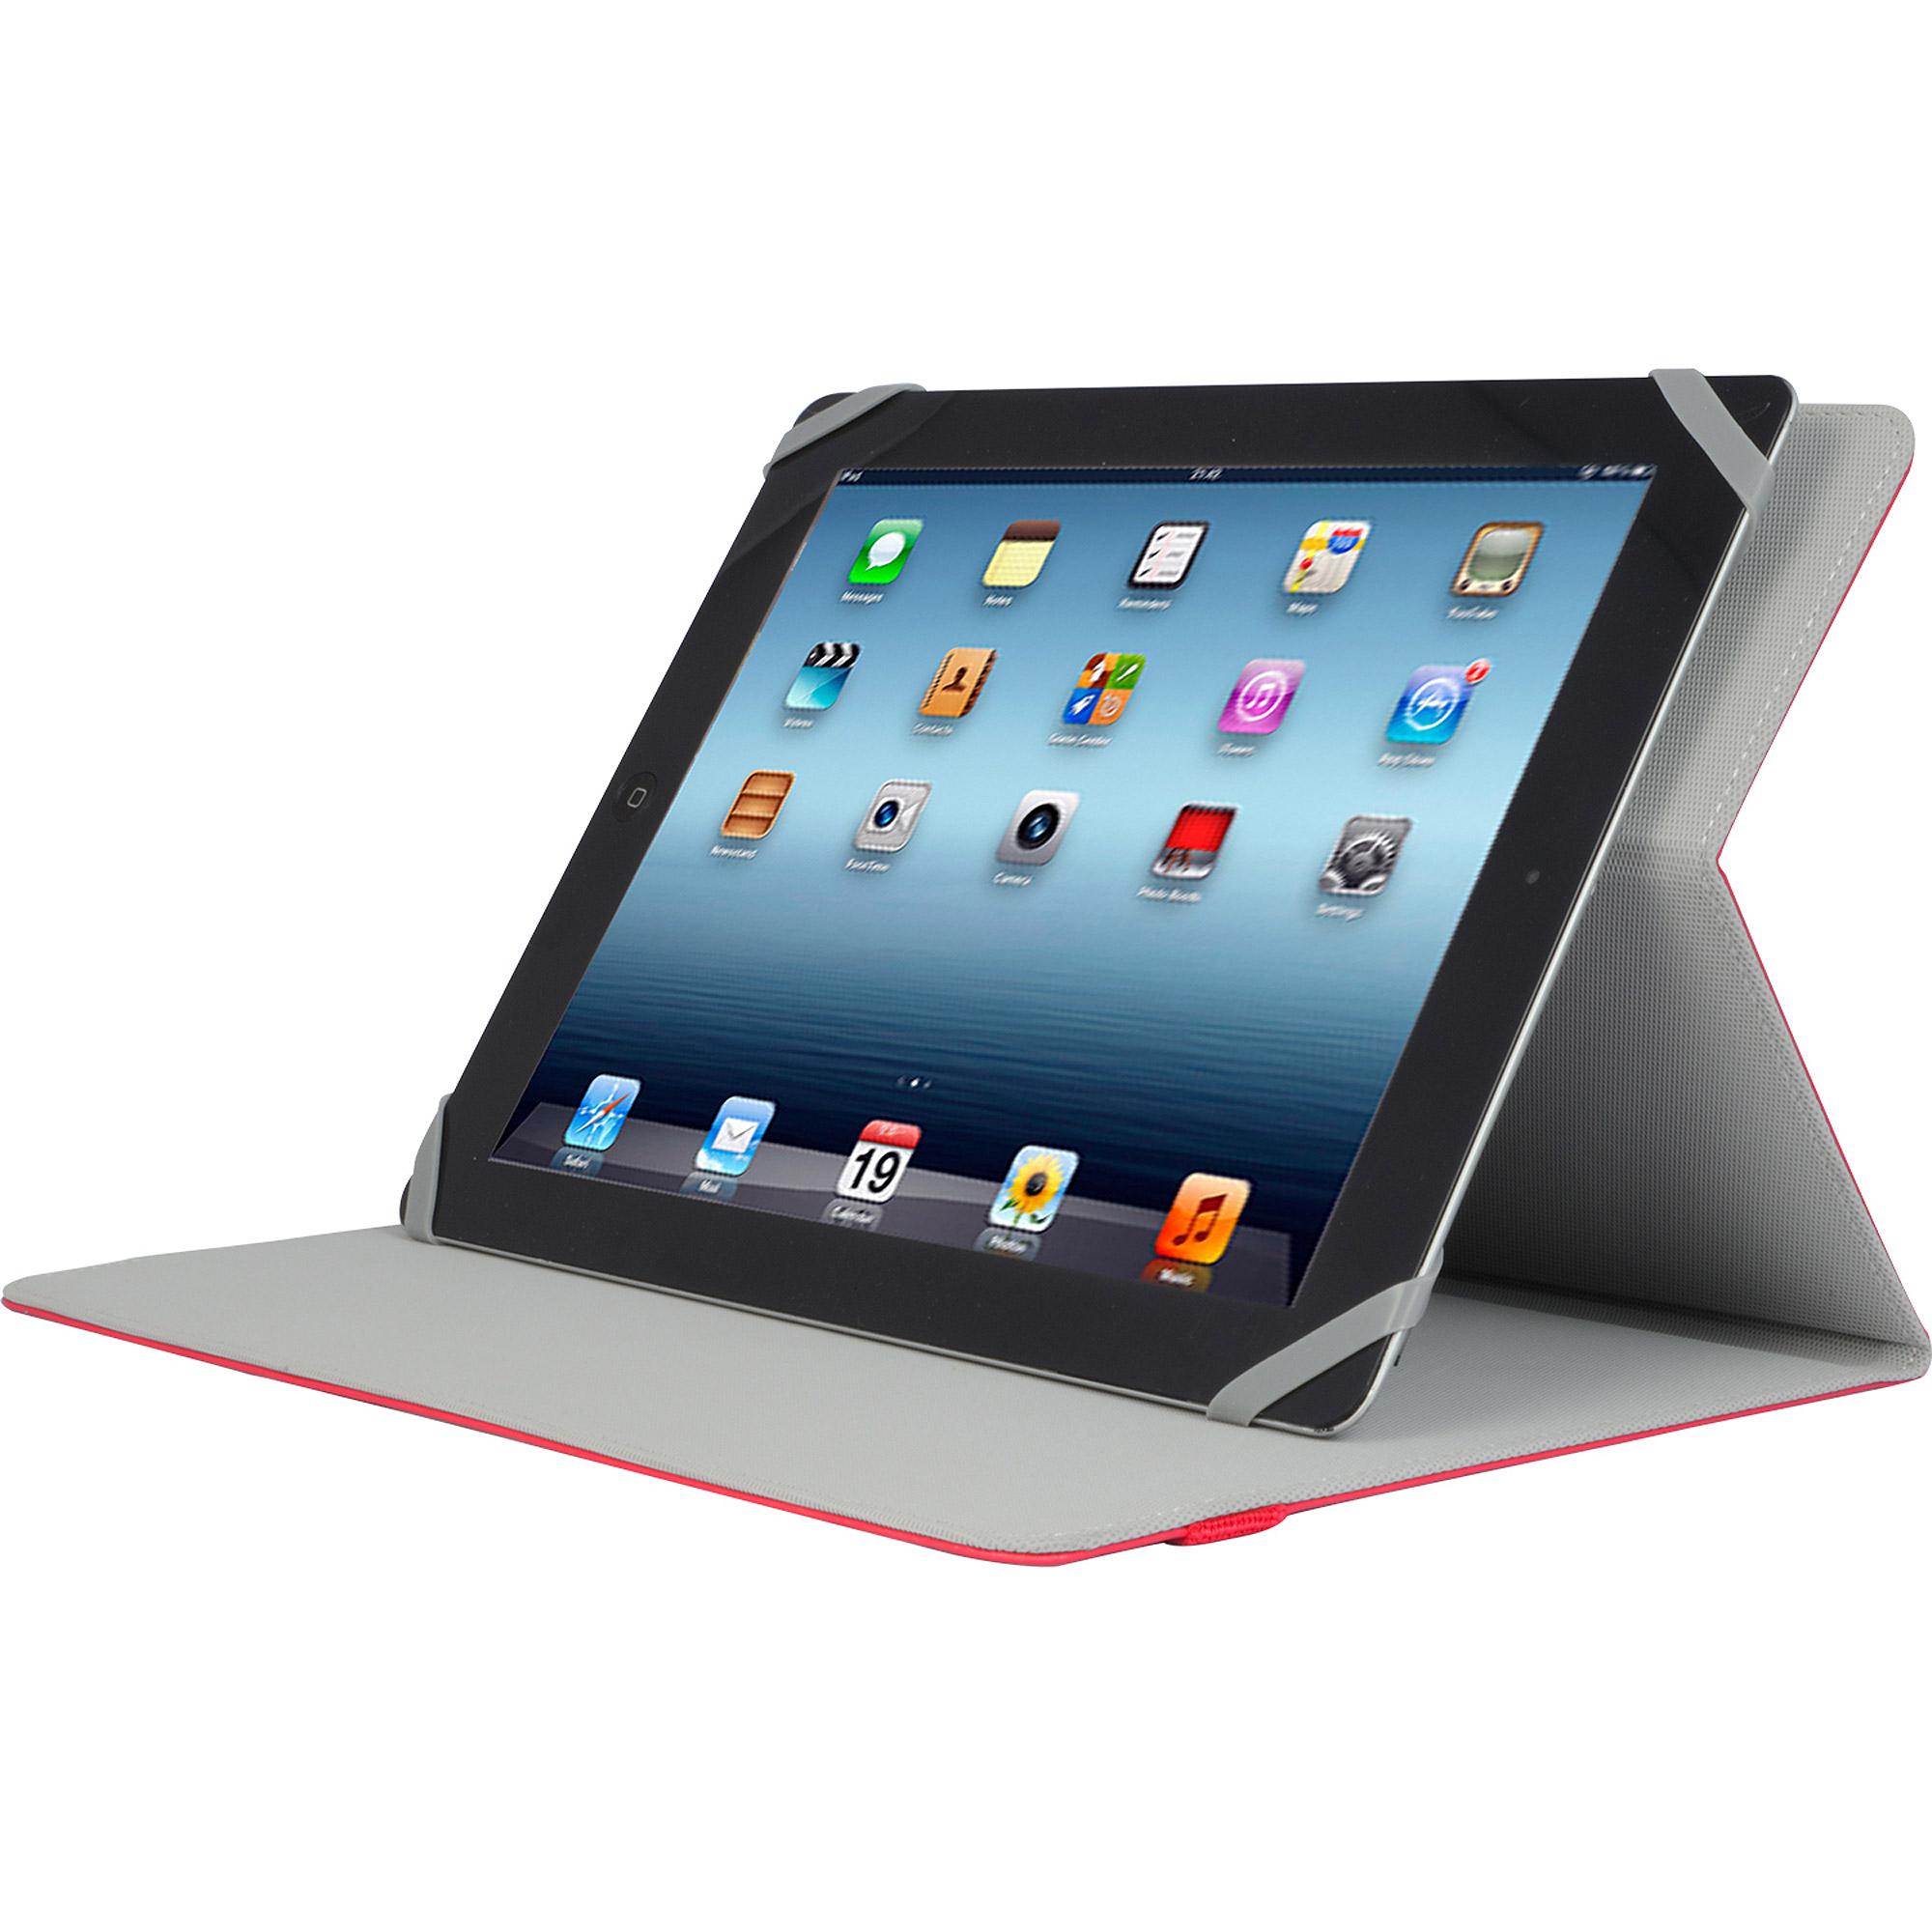 "V7 Slim Universal Folio Case for Apple iPad mini and 7""-8"" Tablet PCs, Red"